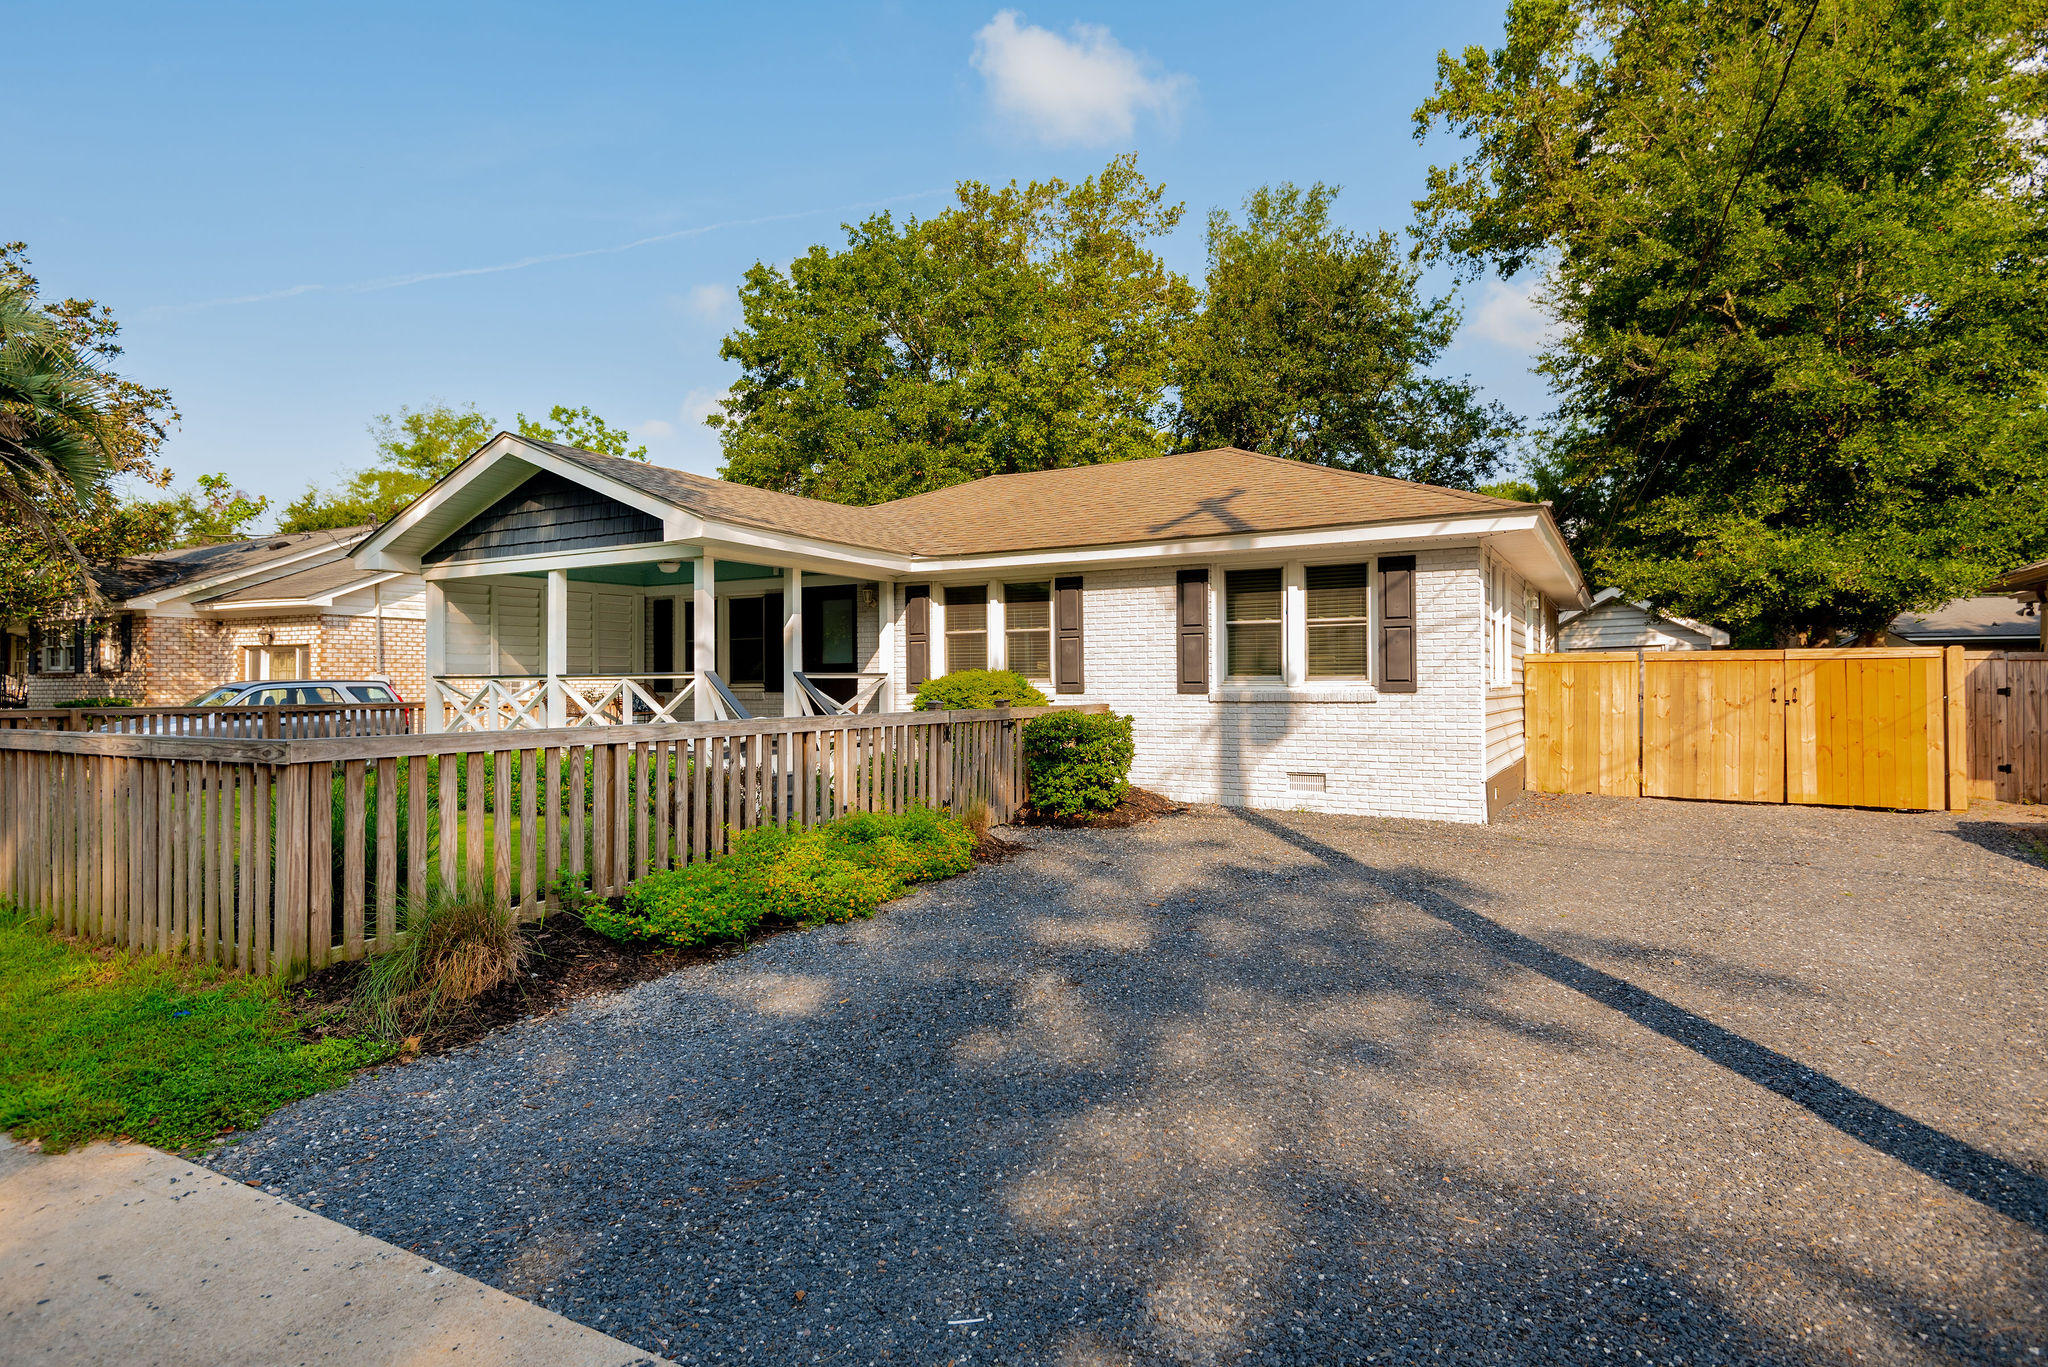 Old Mt Pleasant Homes For Sale - 914 Center, Mount Pleasant, SC - 8